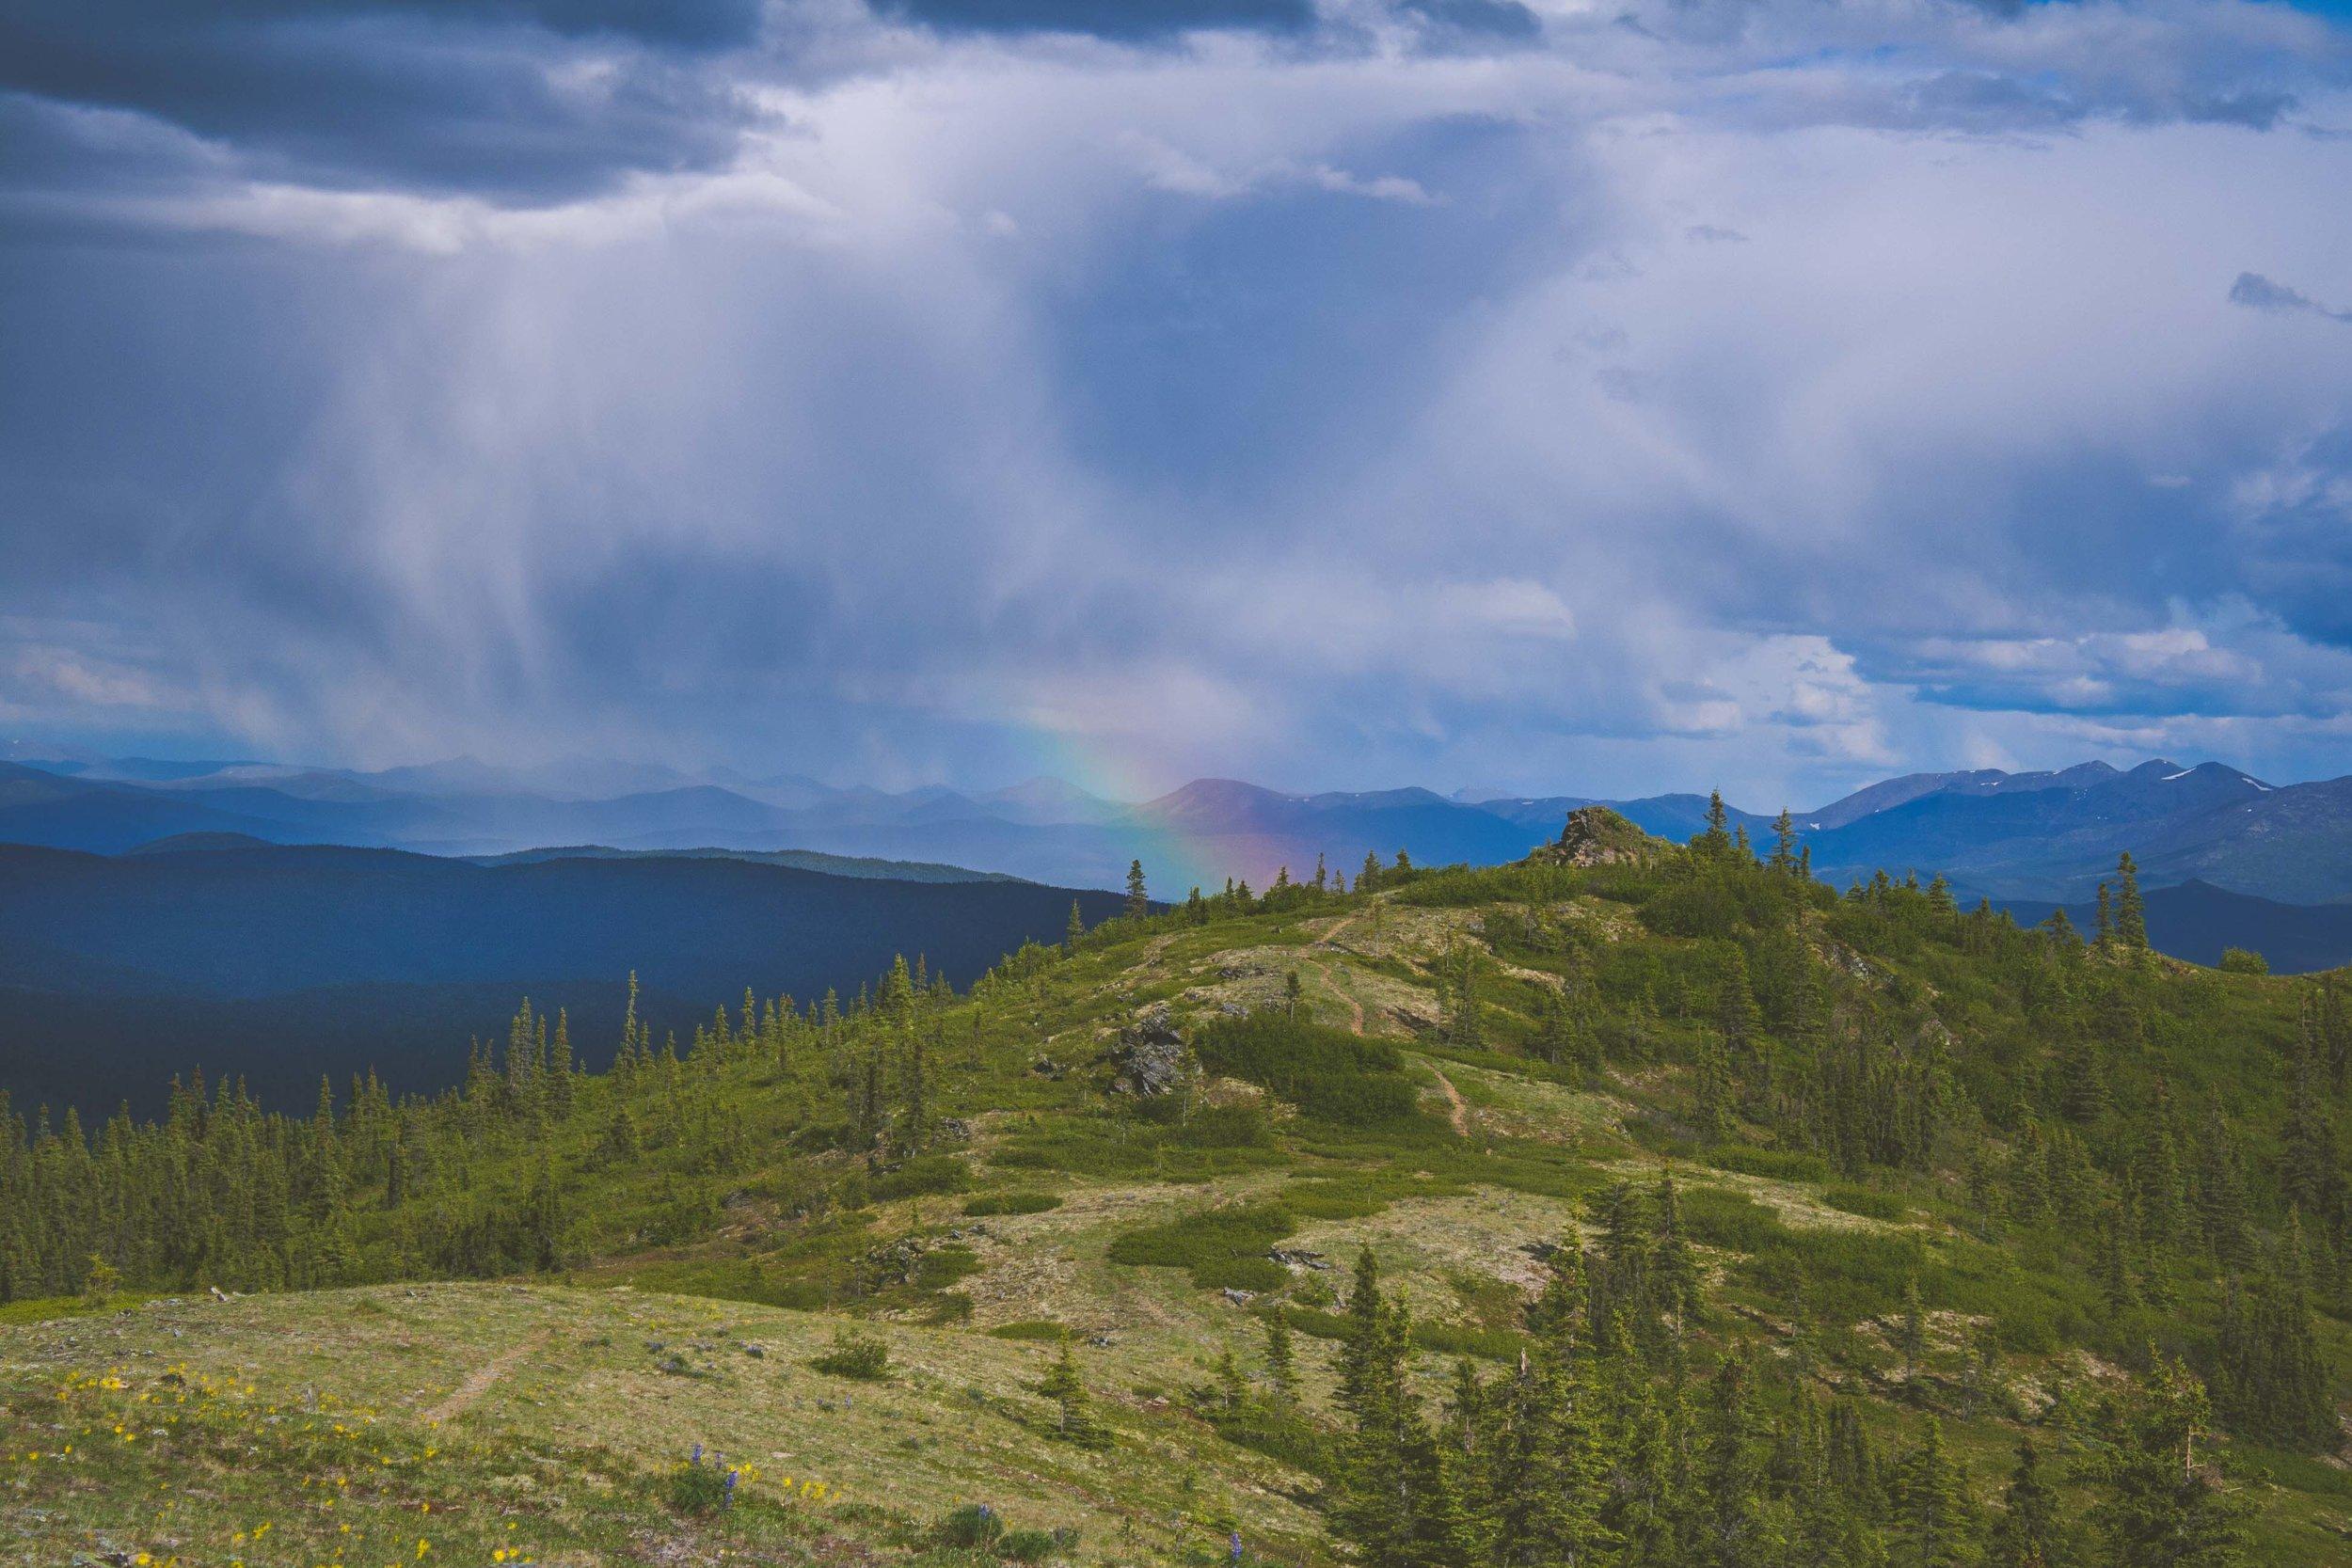 Chena Hot Springs Trail, Alaska. Juni 2015